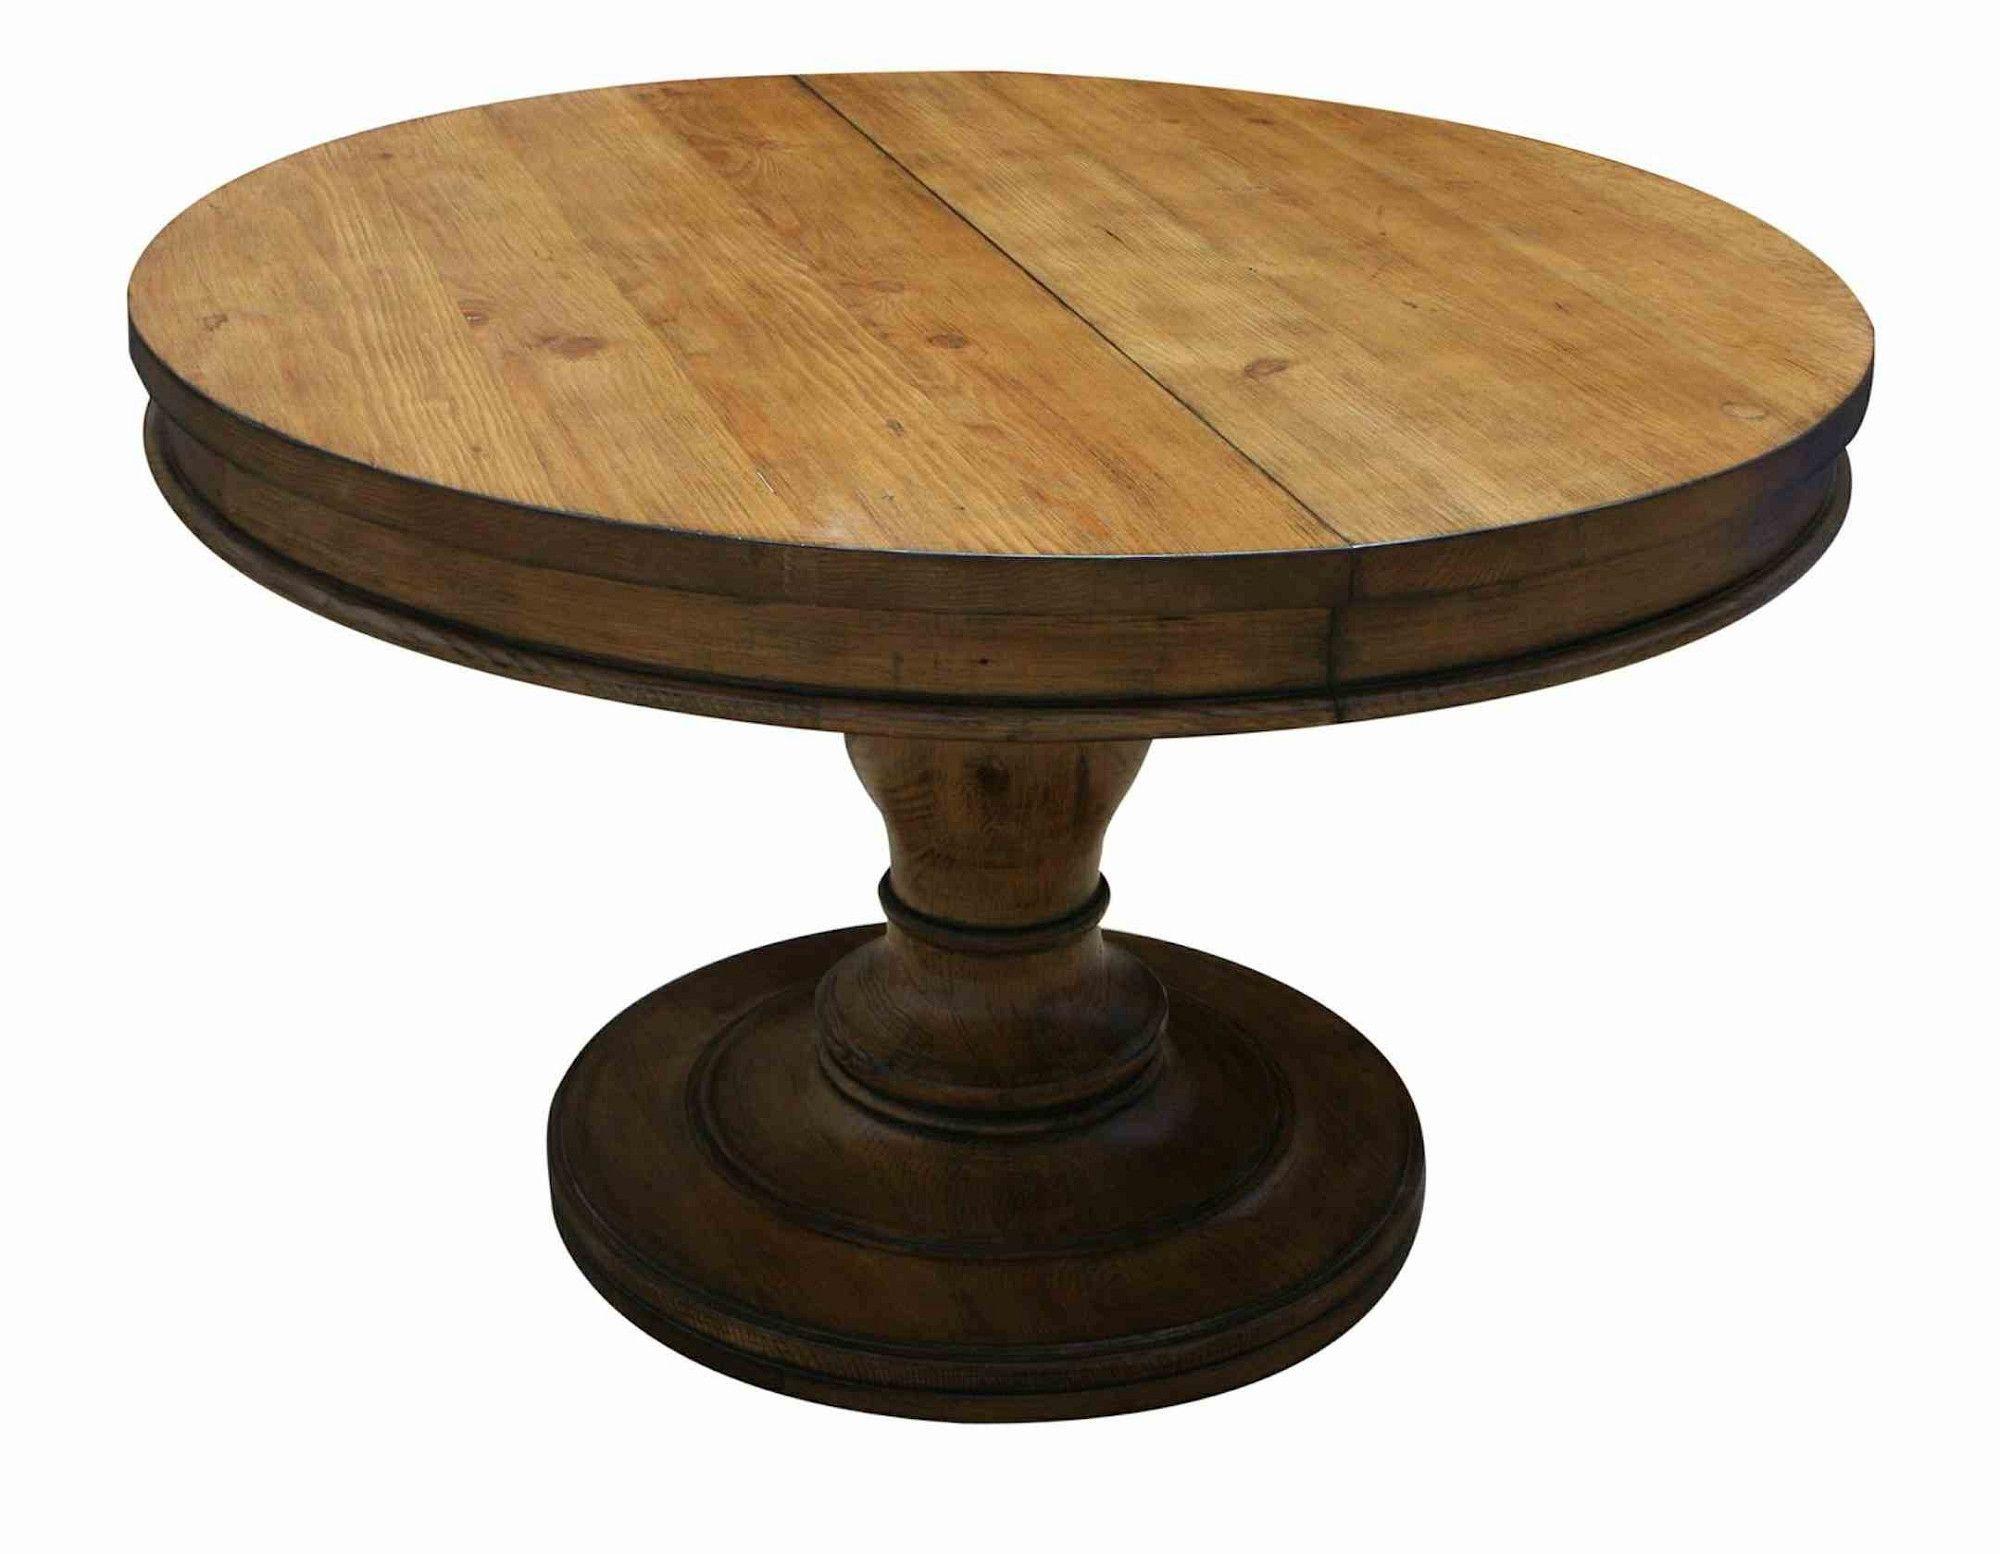 Westport Round Reclaimed Wood Extension Pedestal Table Reclaimed